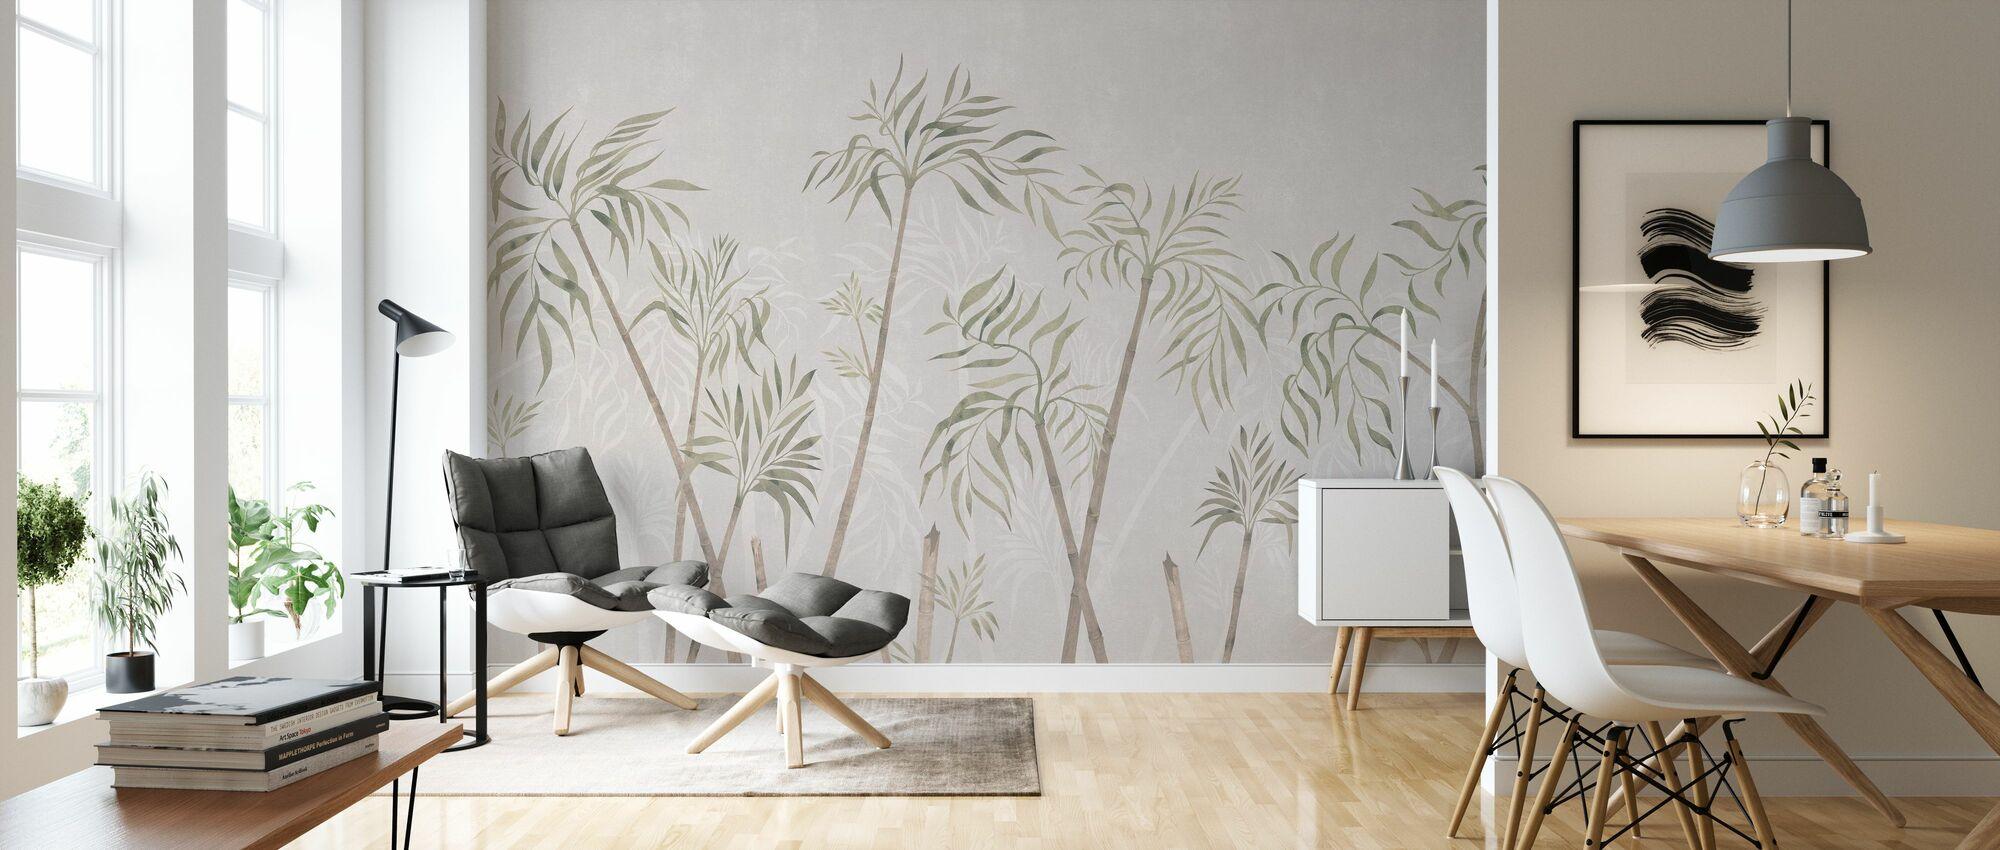 Bamboo Harmony - Nude Natur - Wallpaper - Living Room